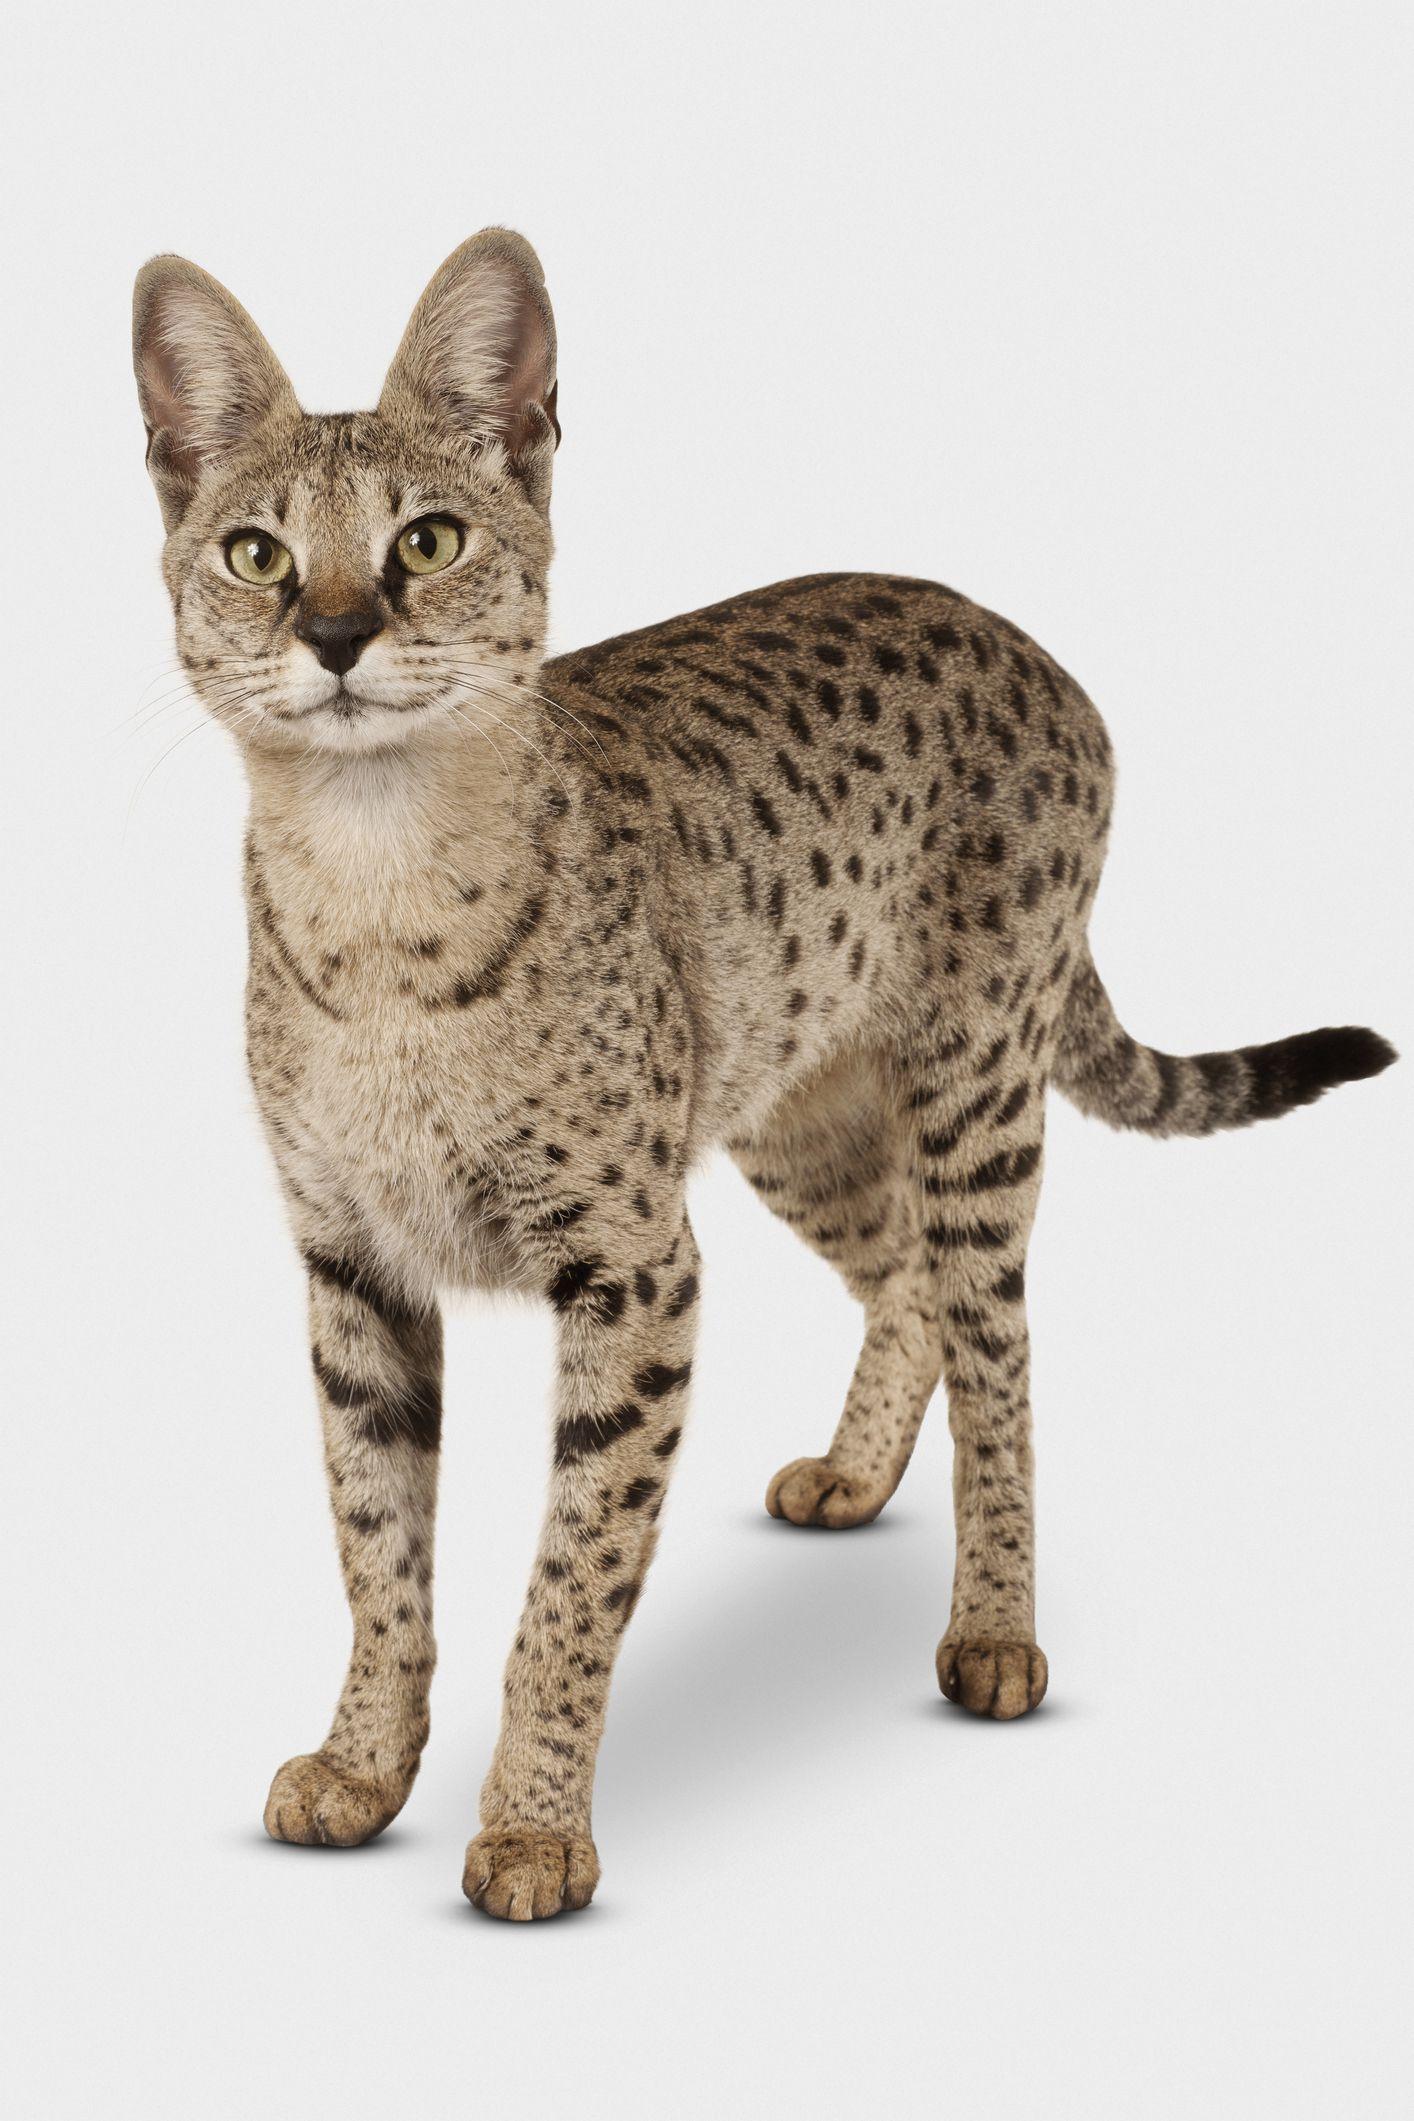 Hybrid Cats That Evoke Their Wild Cousins Cat breeds